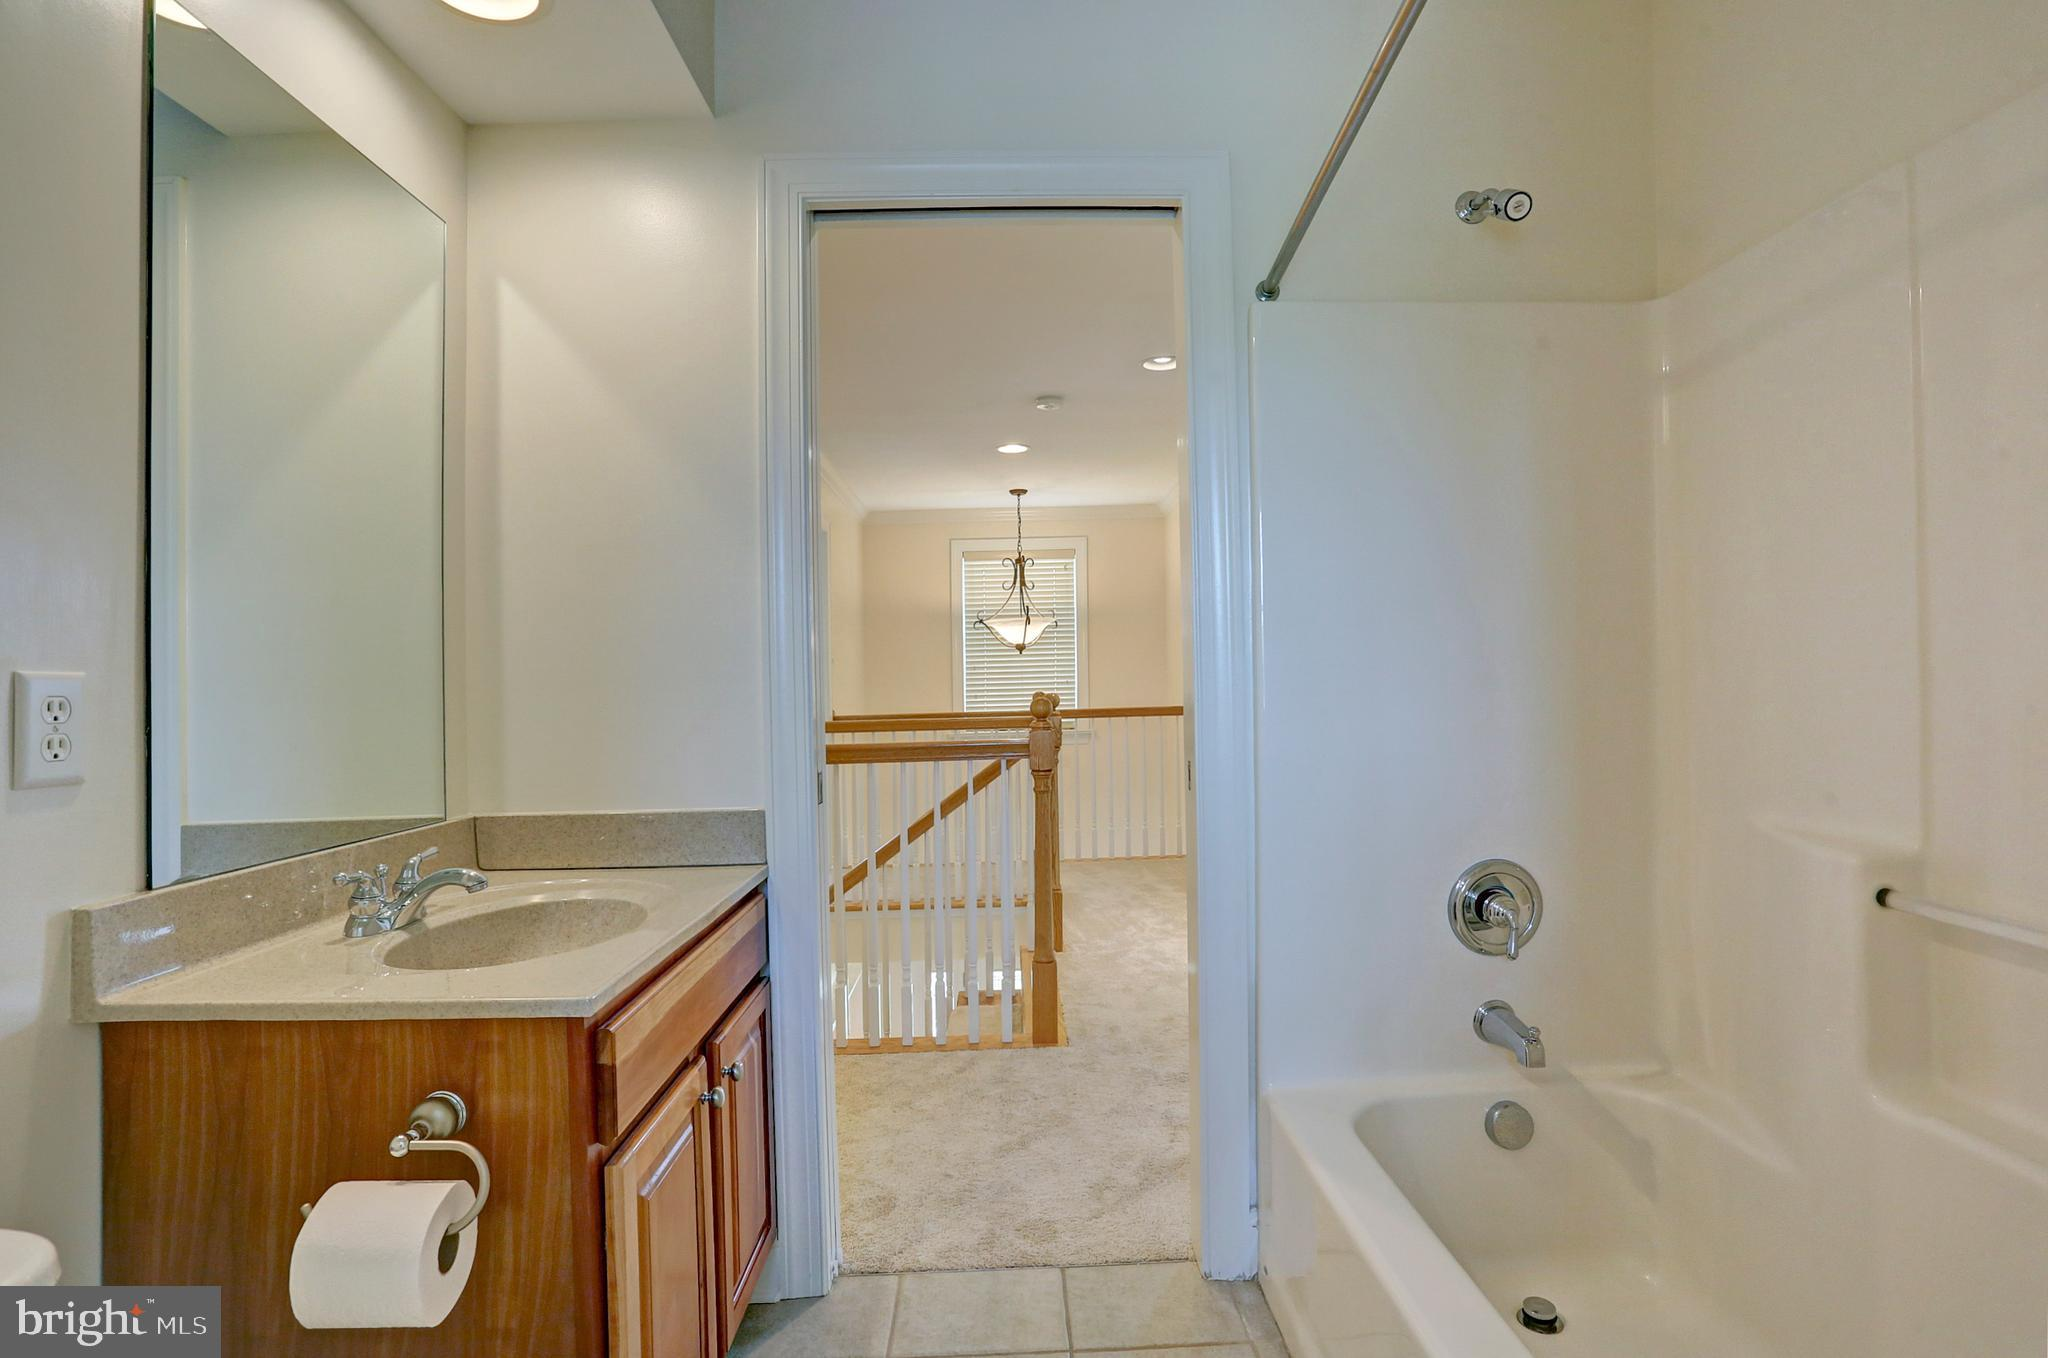 Tile Floors in the Guest Bathroom